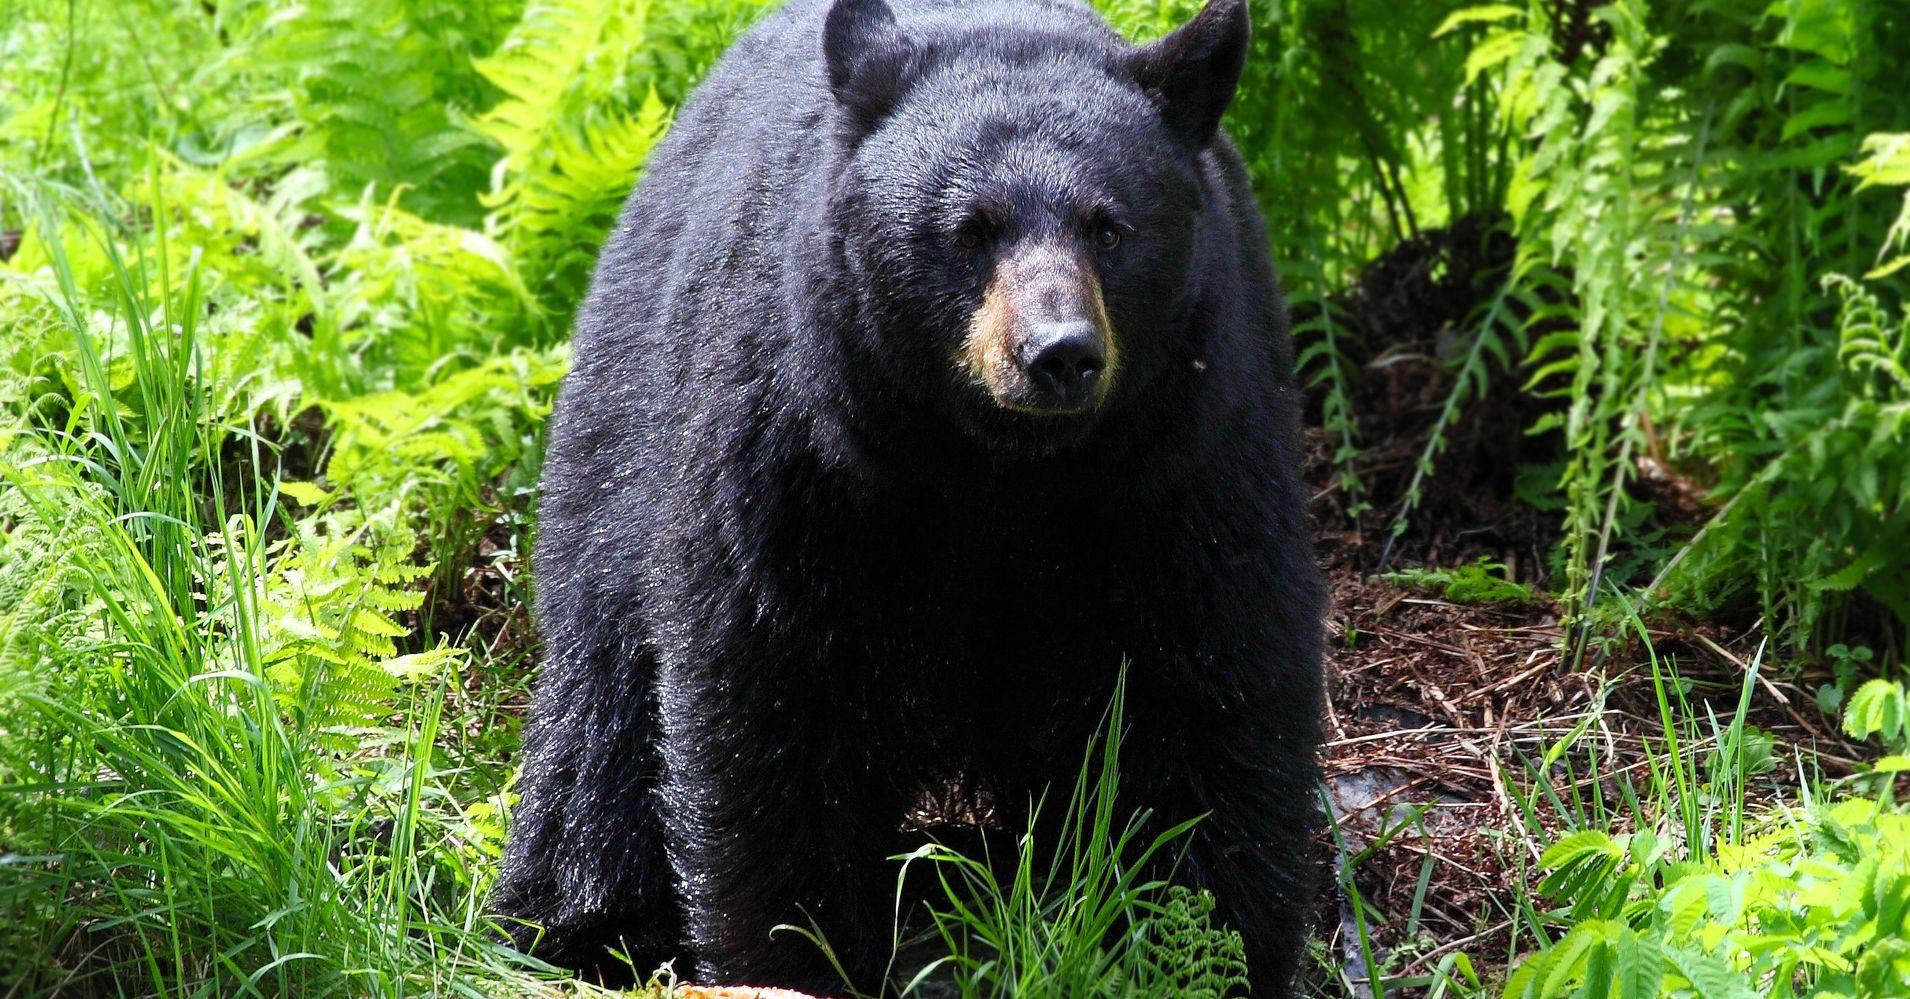 2 'Really Odd' Fatal Black Bear Attacks Concern Wildlife Experts